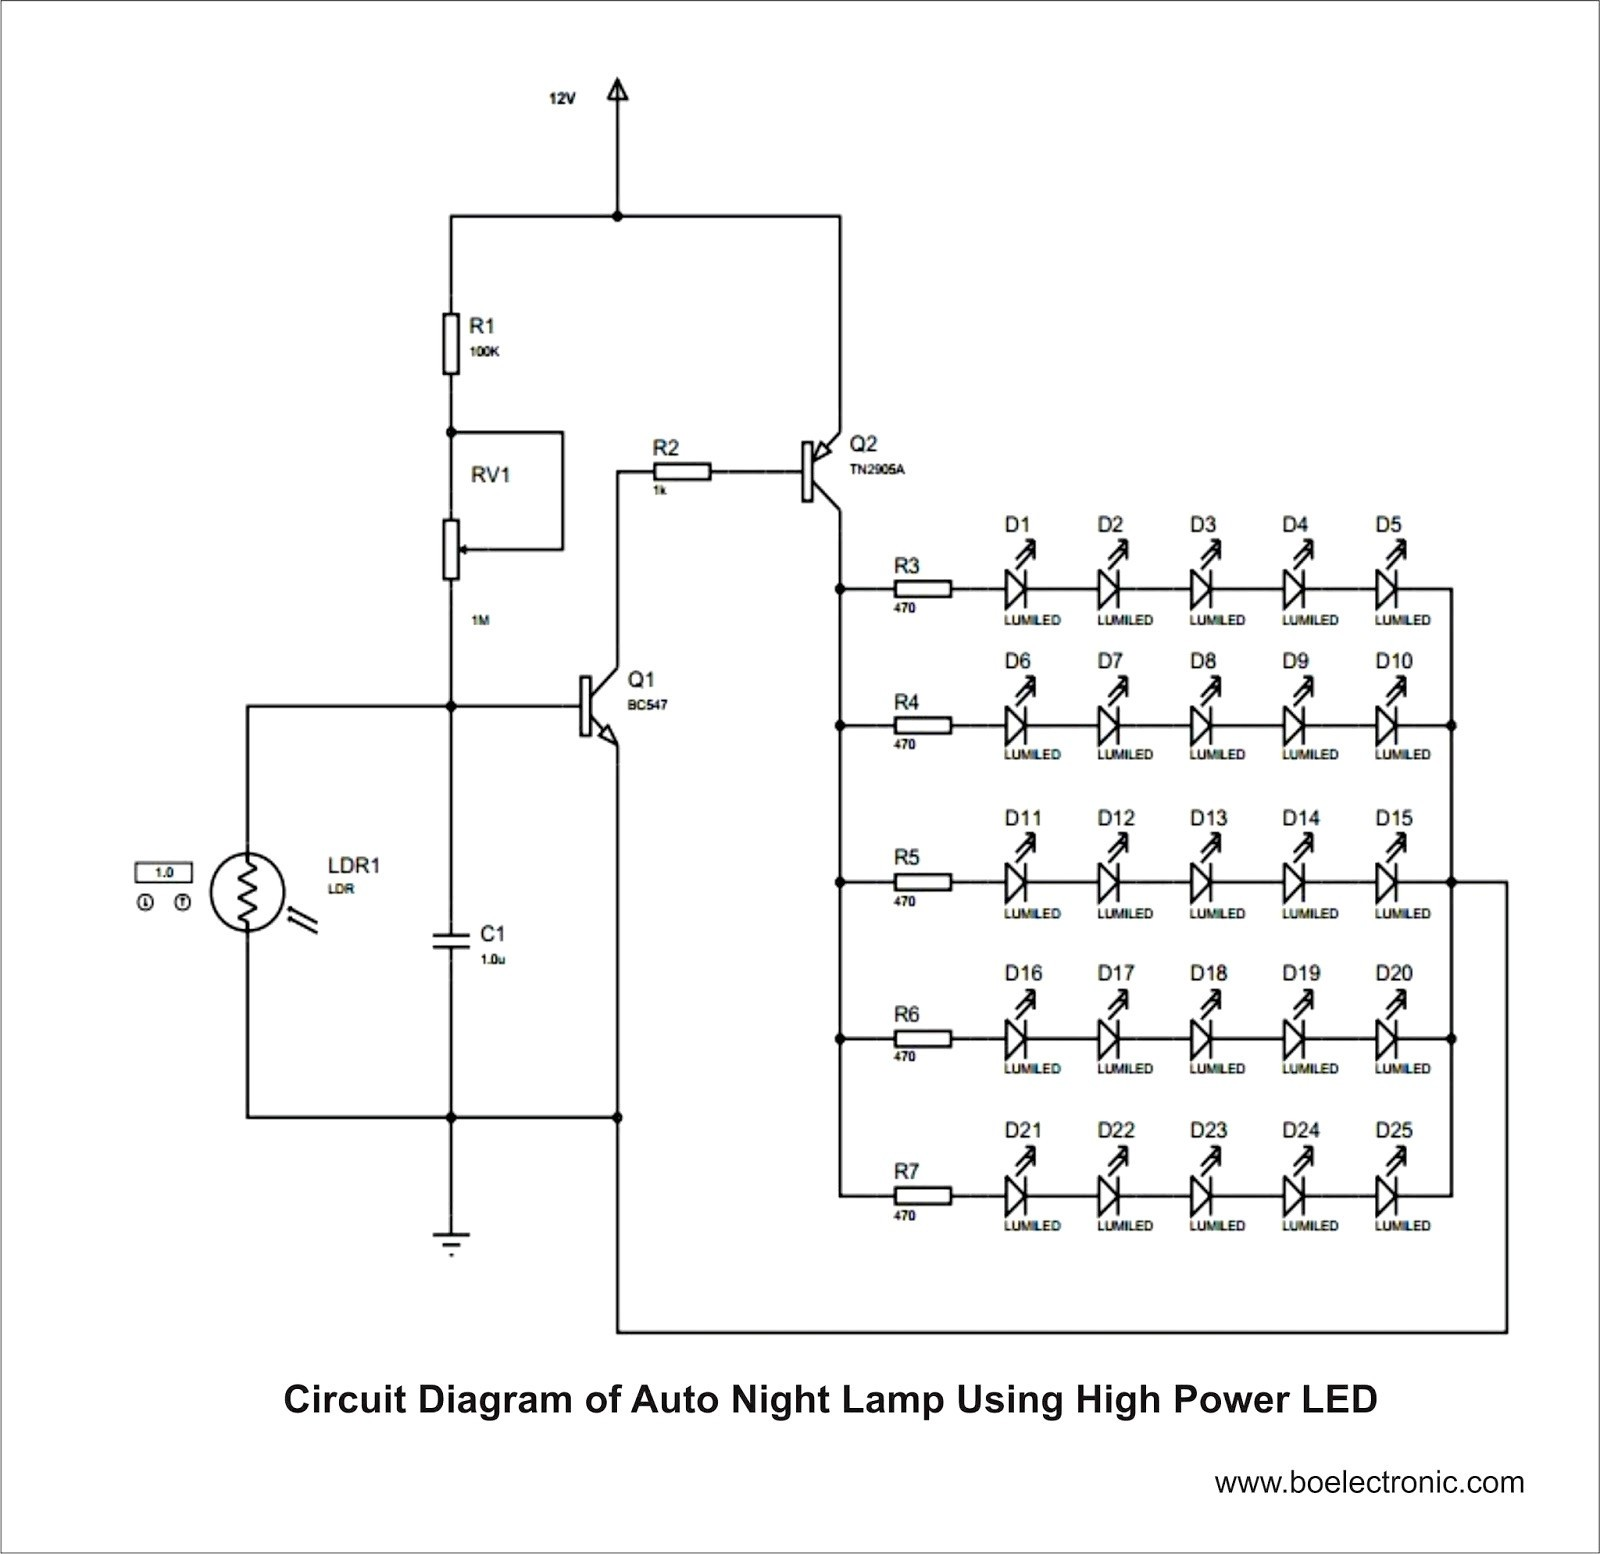 Solar Street Light Circuit Diagram ponent Led Lamp Circuit 220v Light Operated Night Control